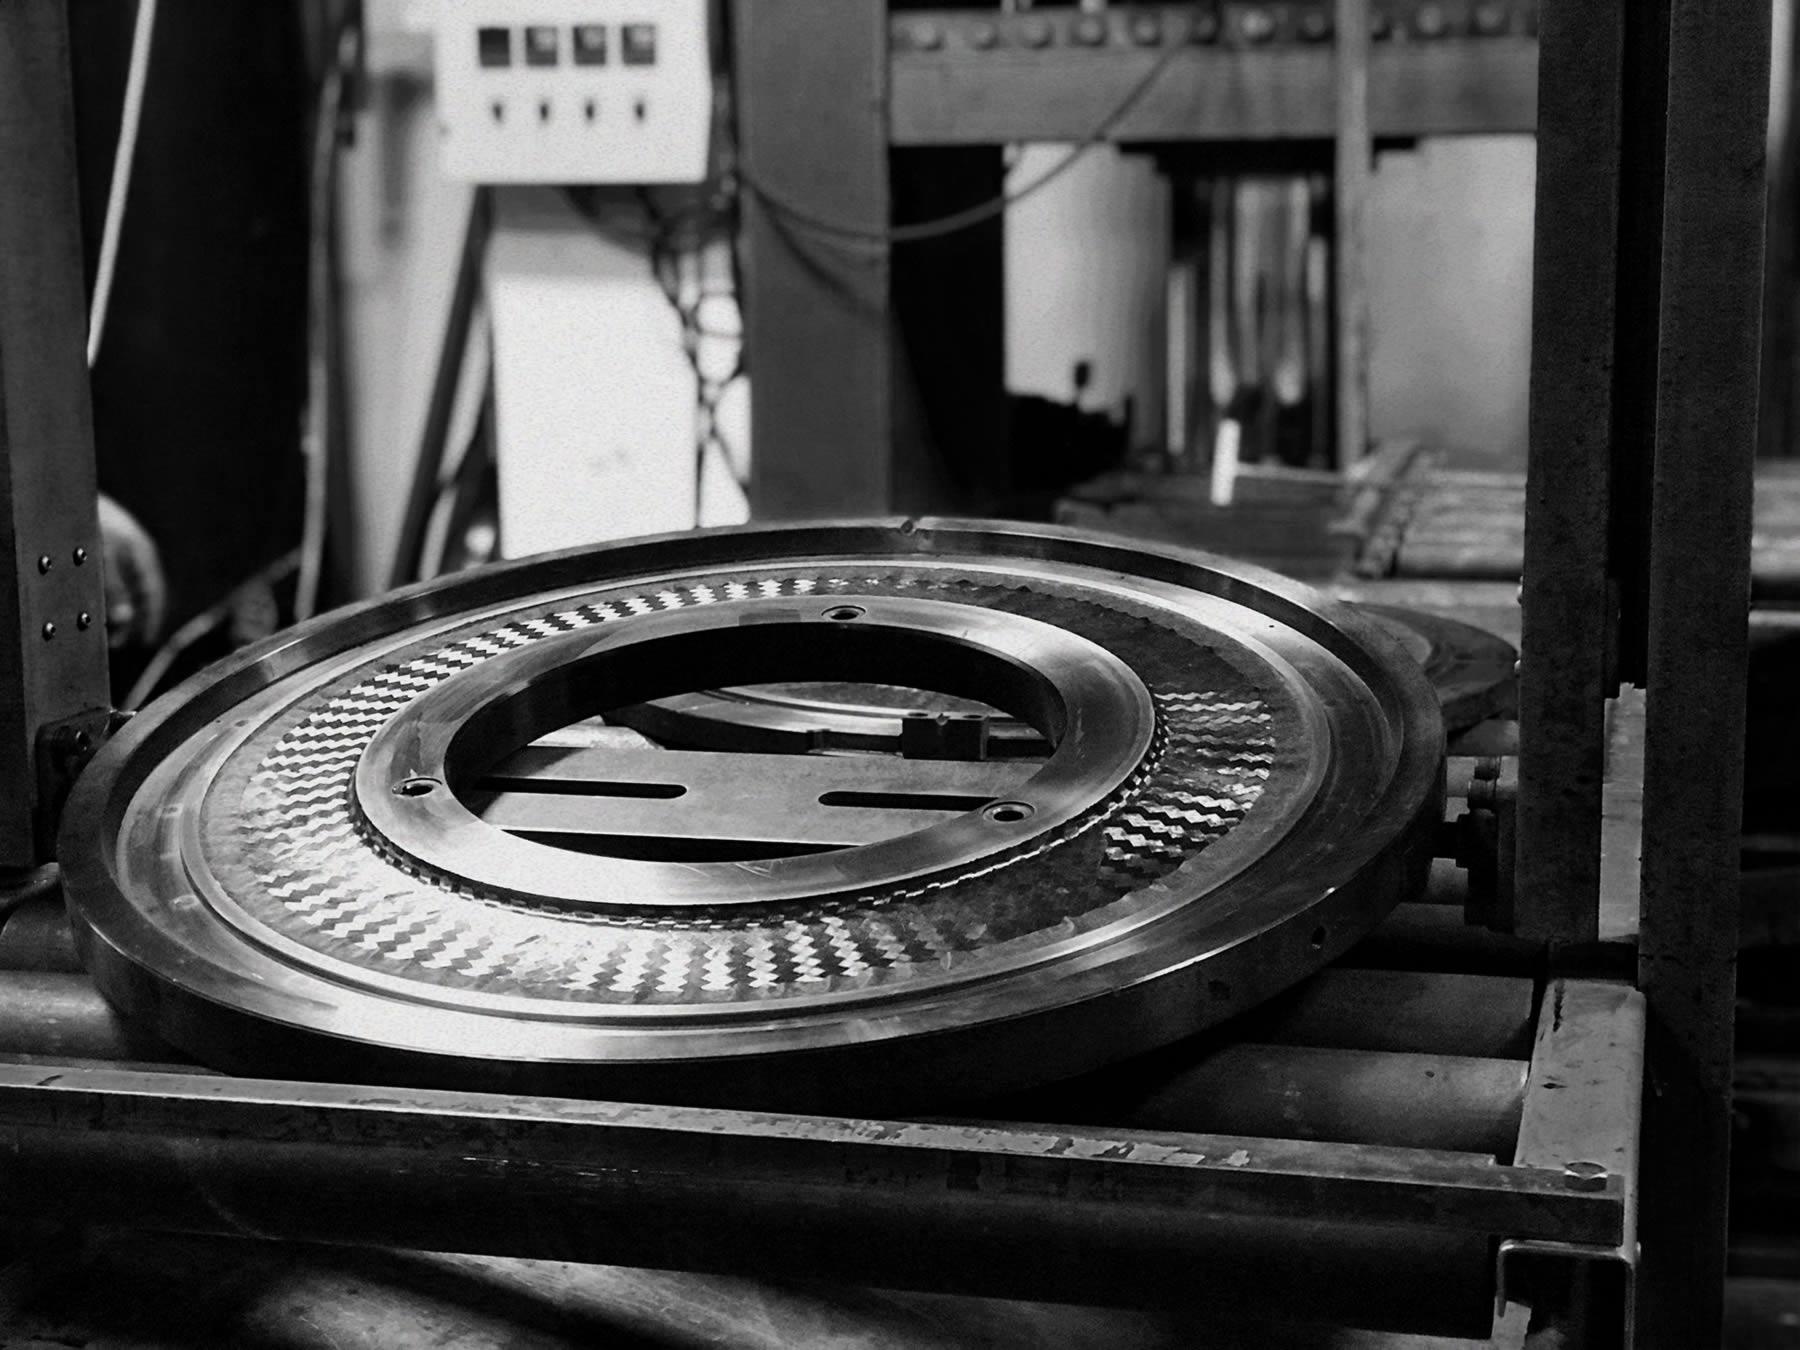 Carbon Wheels Rim Technology